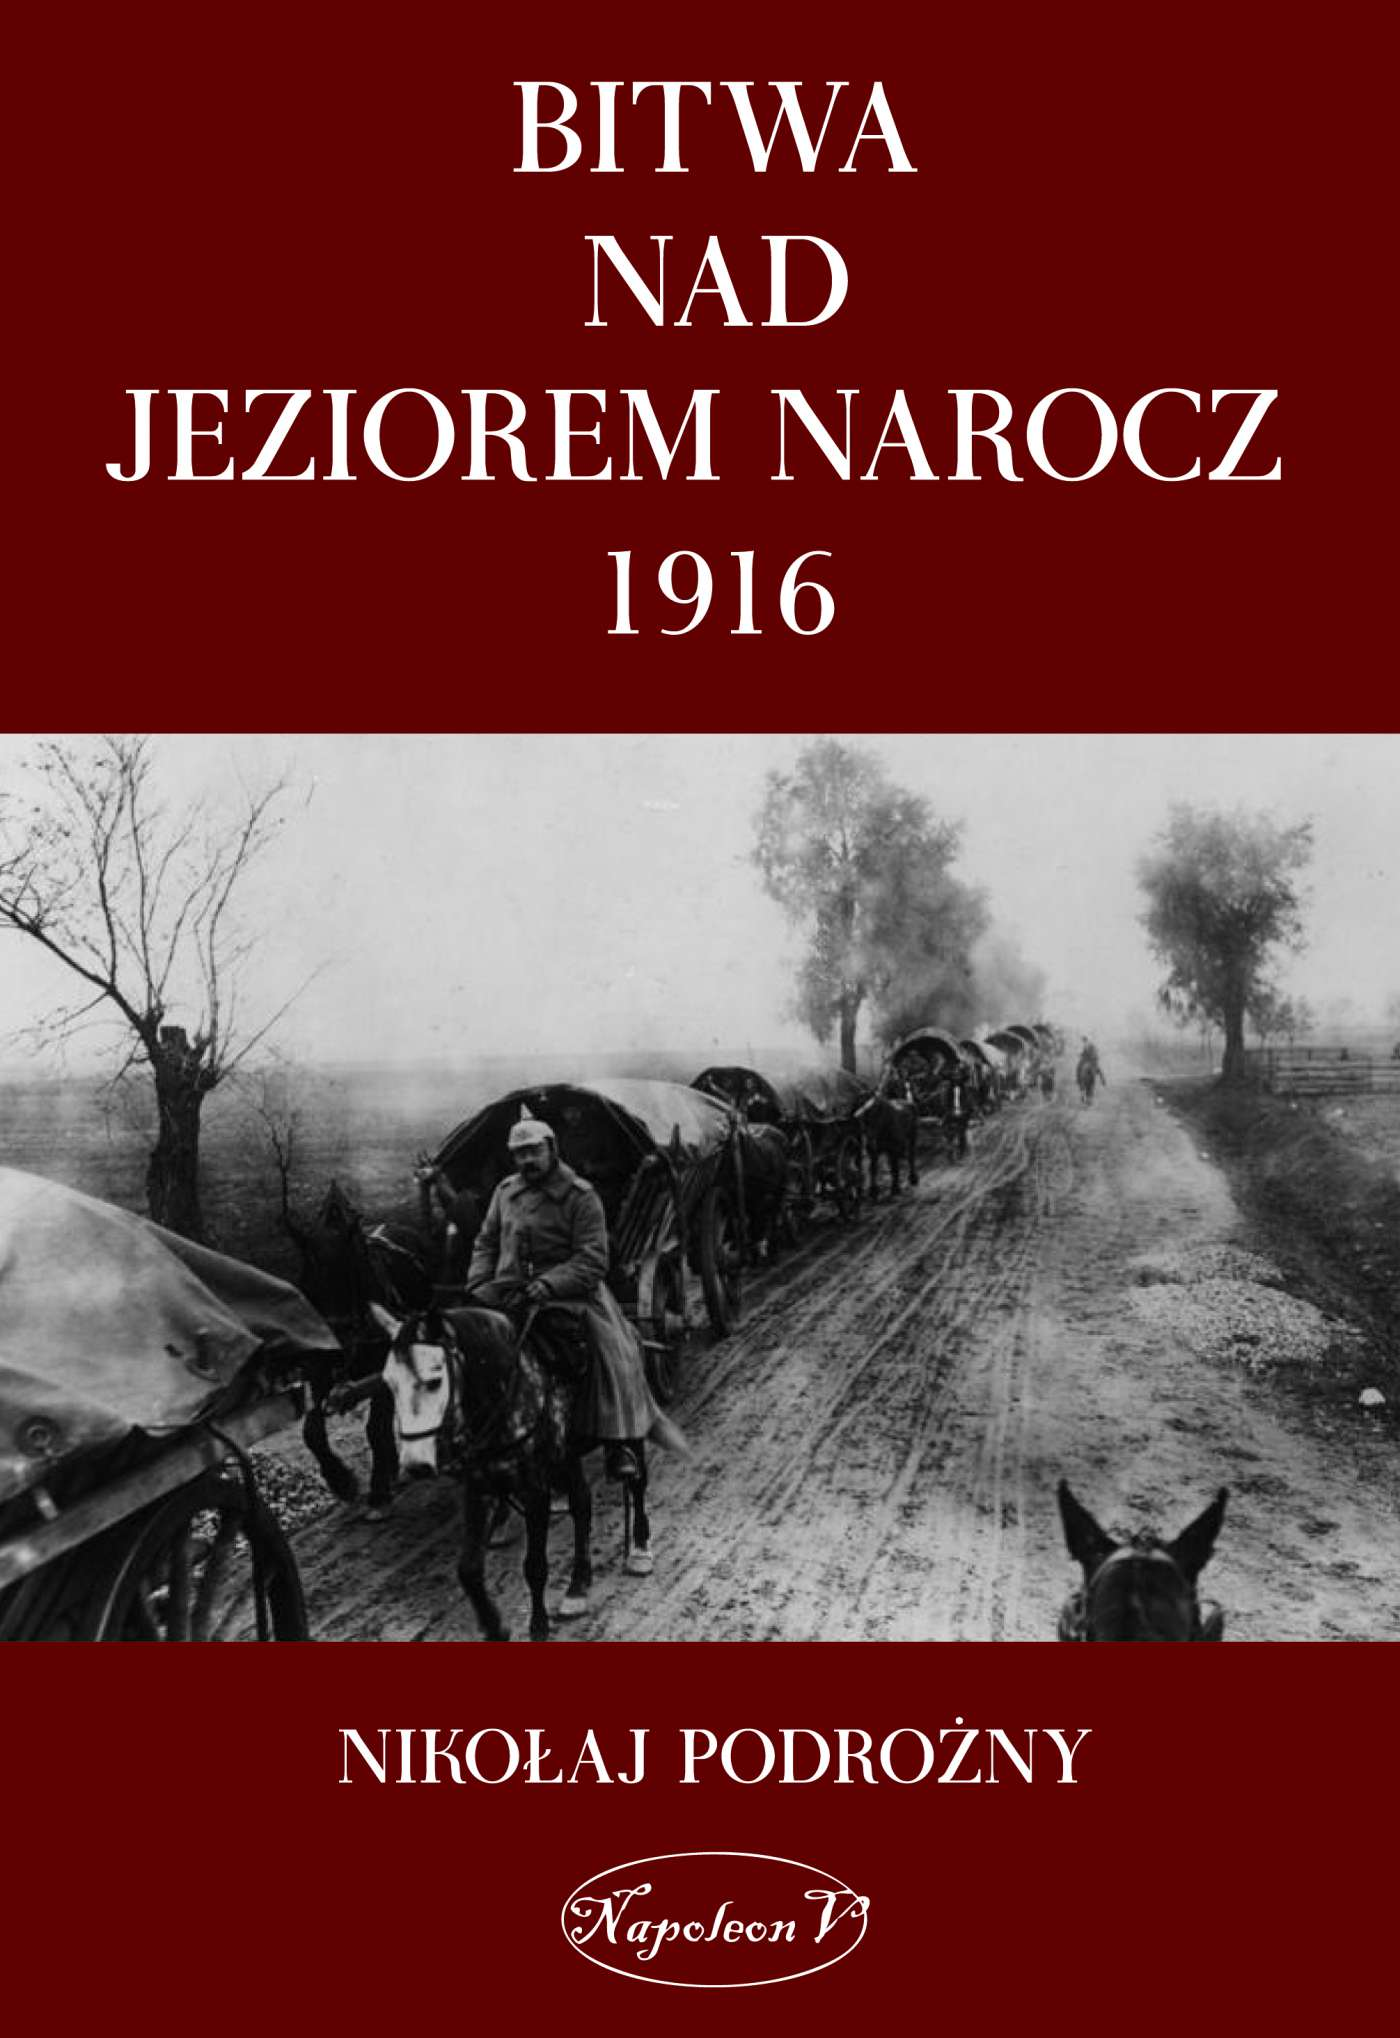 Bitwa na Jeziorem Narocz 1916 - Ebook (Książka na Kindle) do pobrania w formacie MOBI